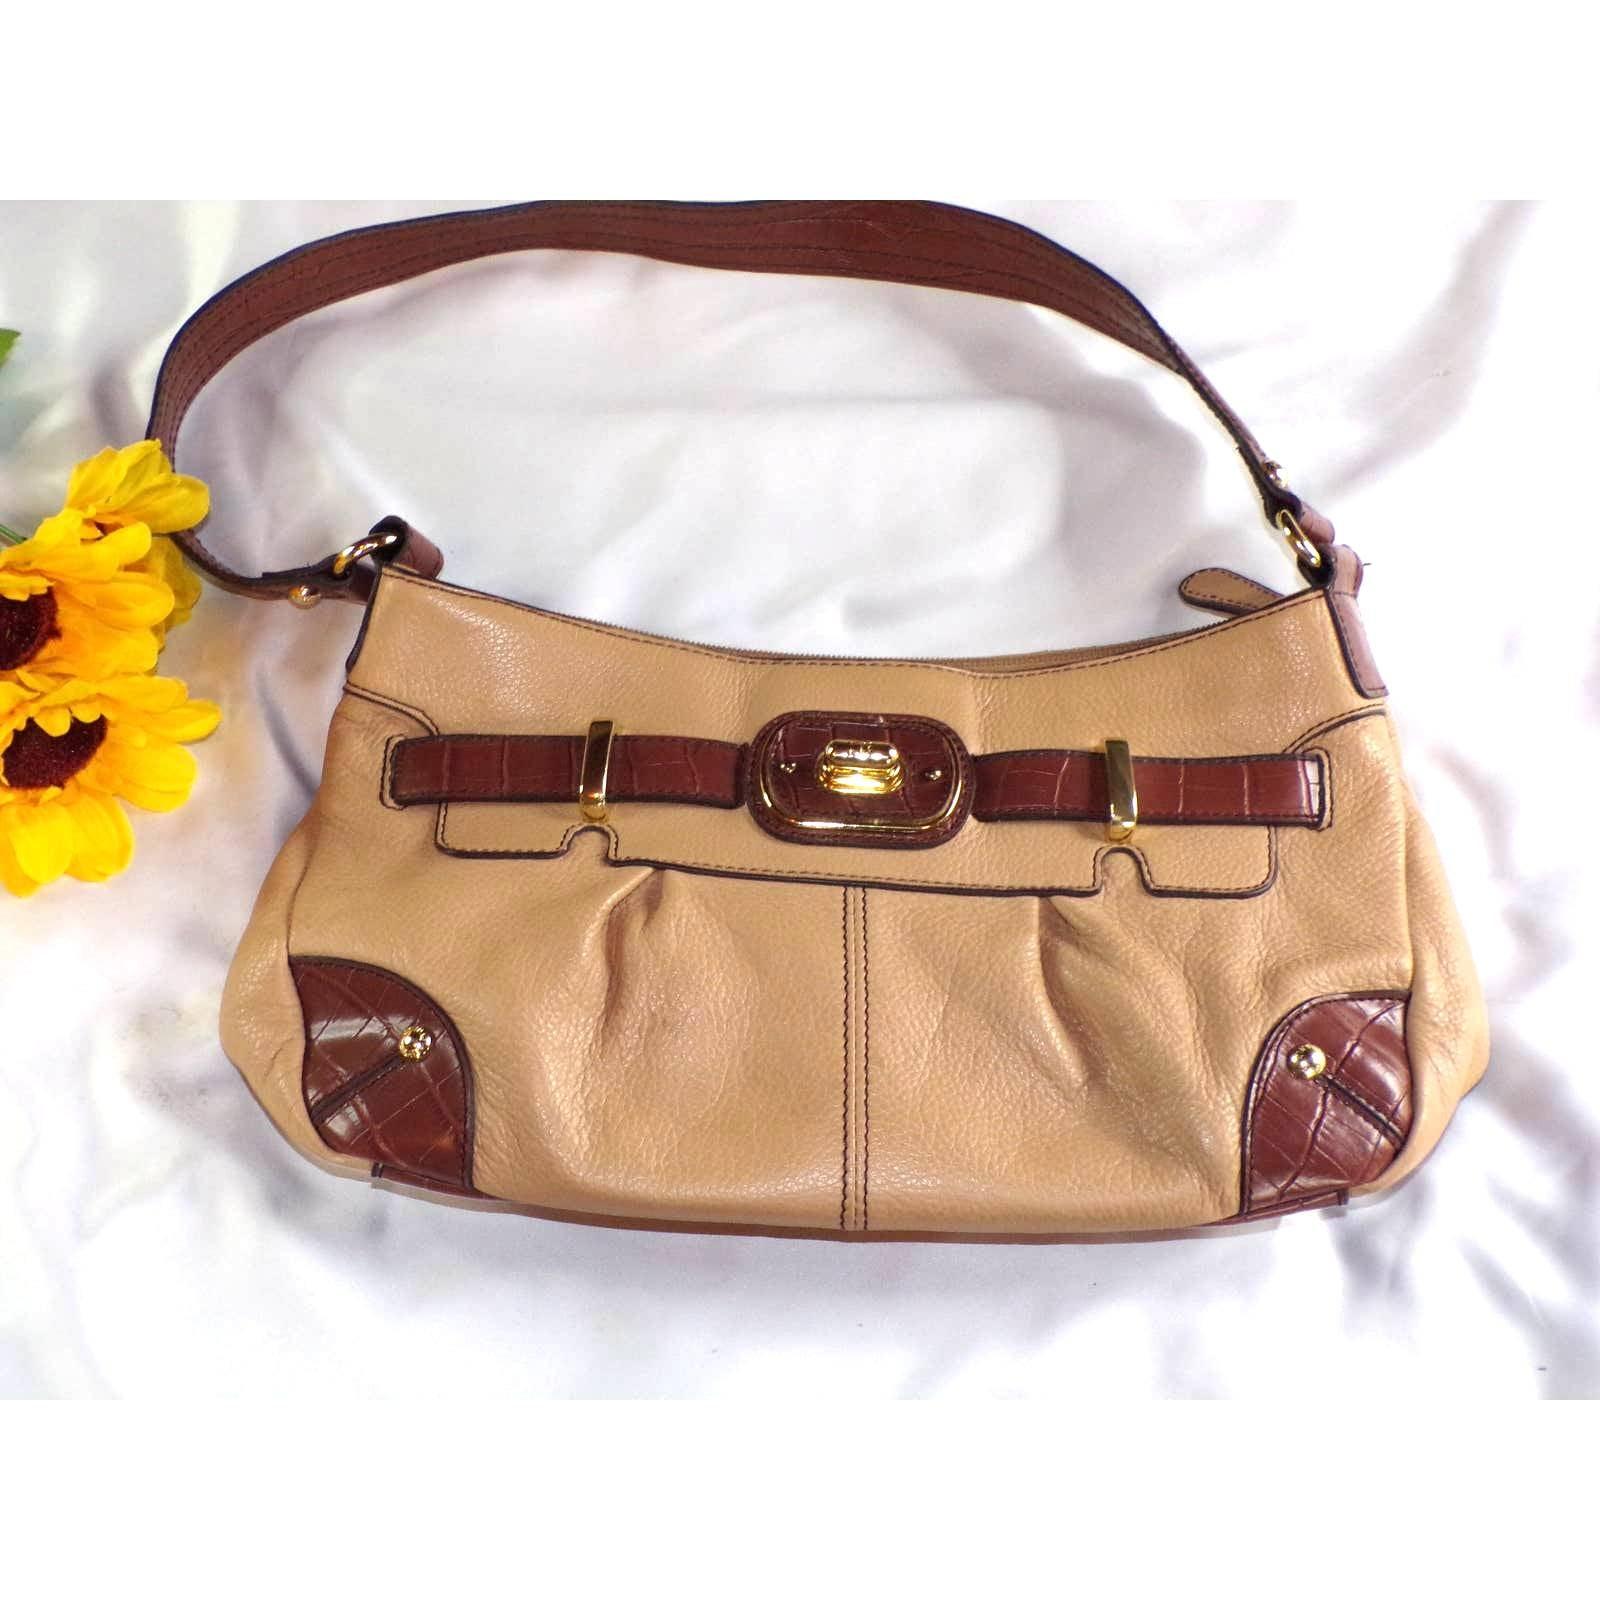 Etienne Aigner Leather Handbag Tan